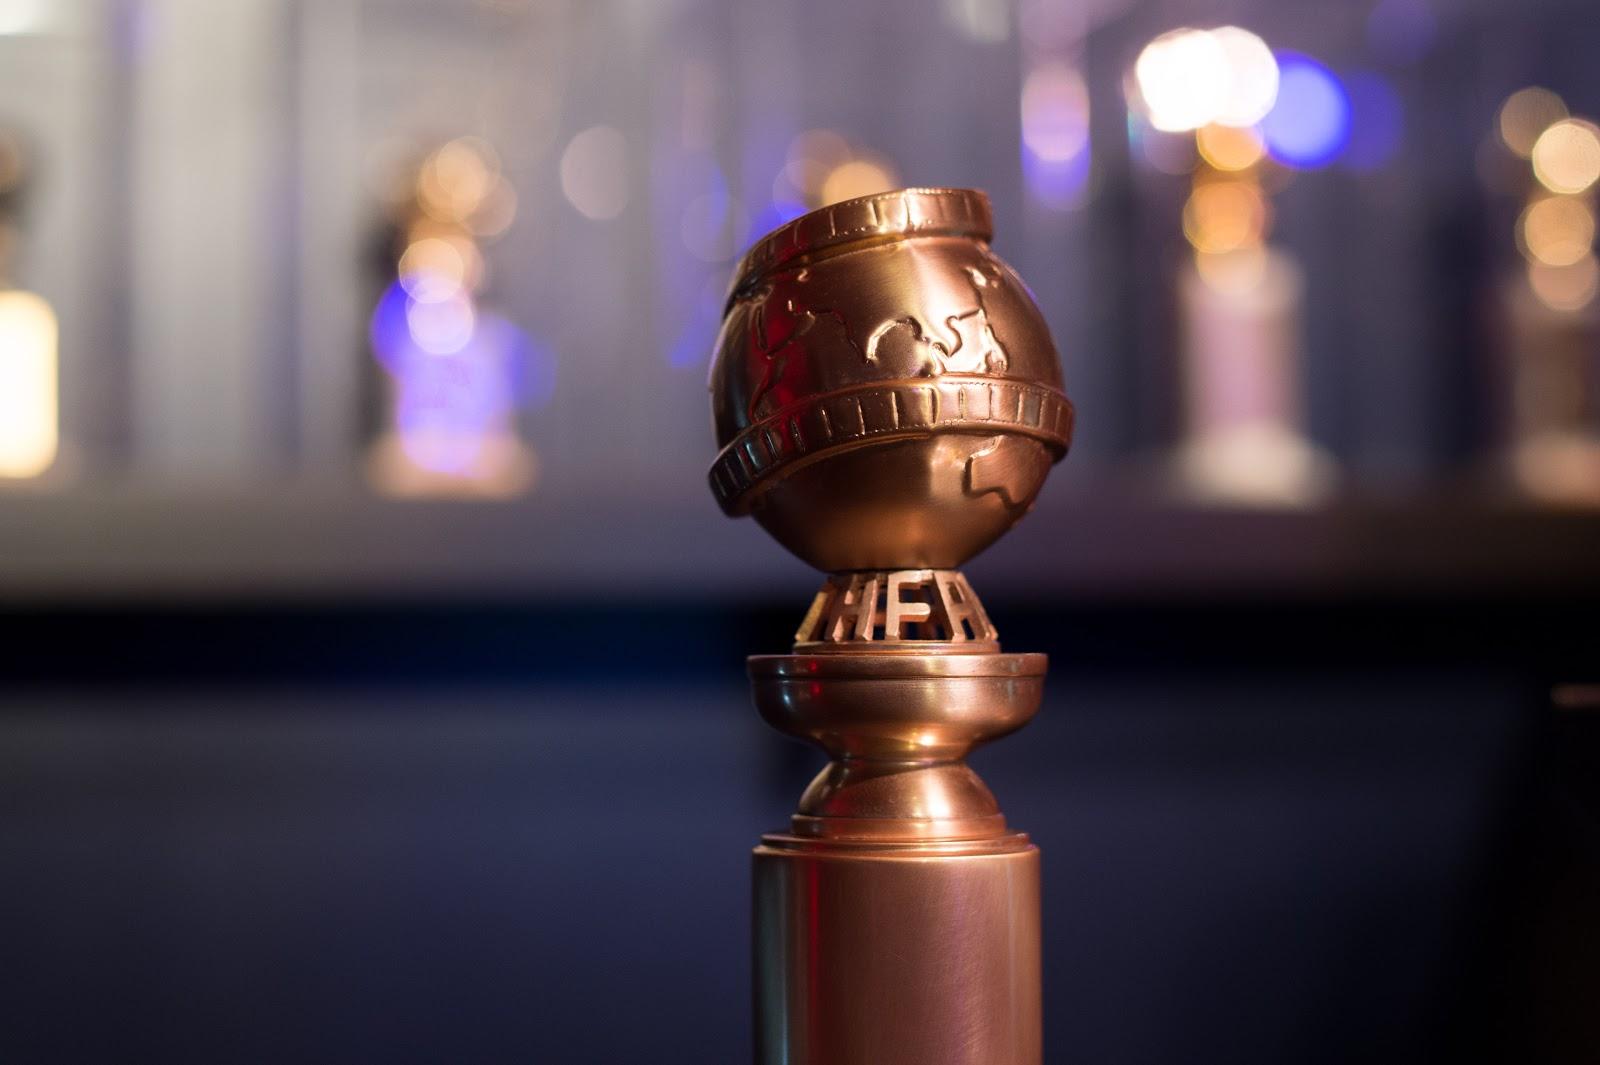 New Golden Globe statue, 2019 Via HFPA